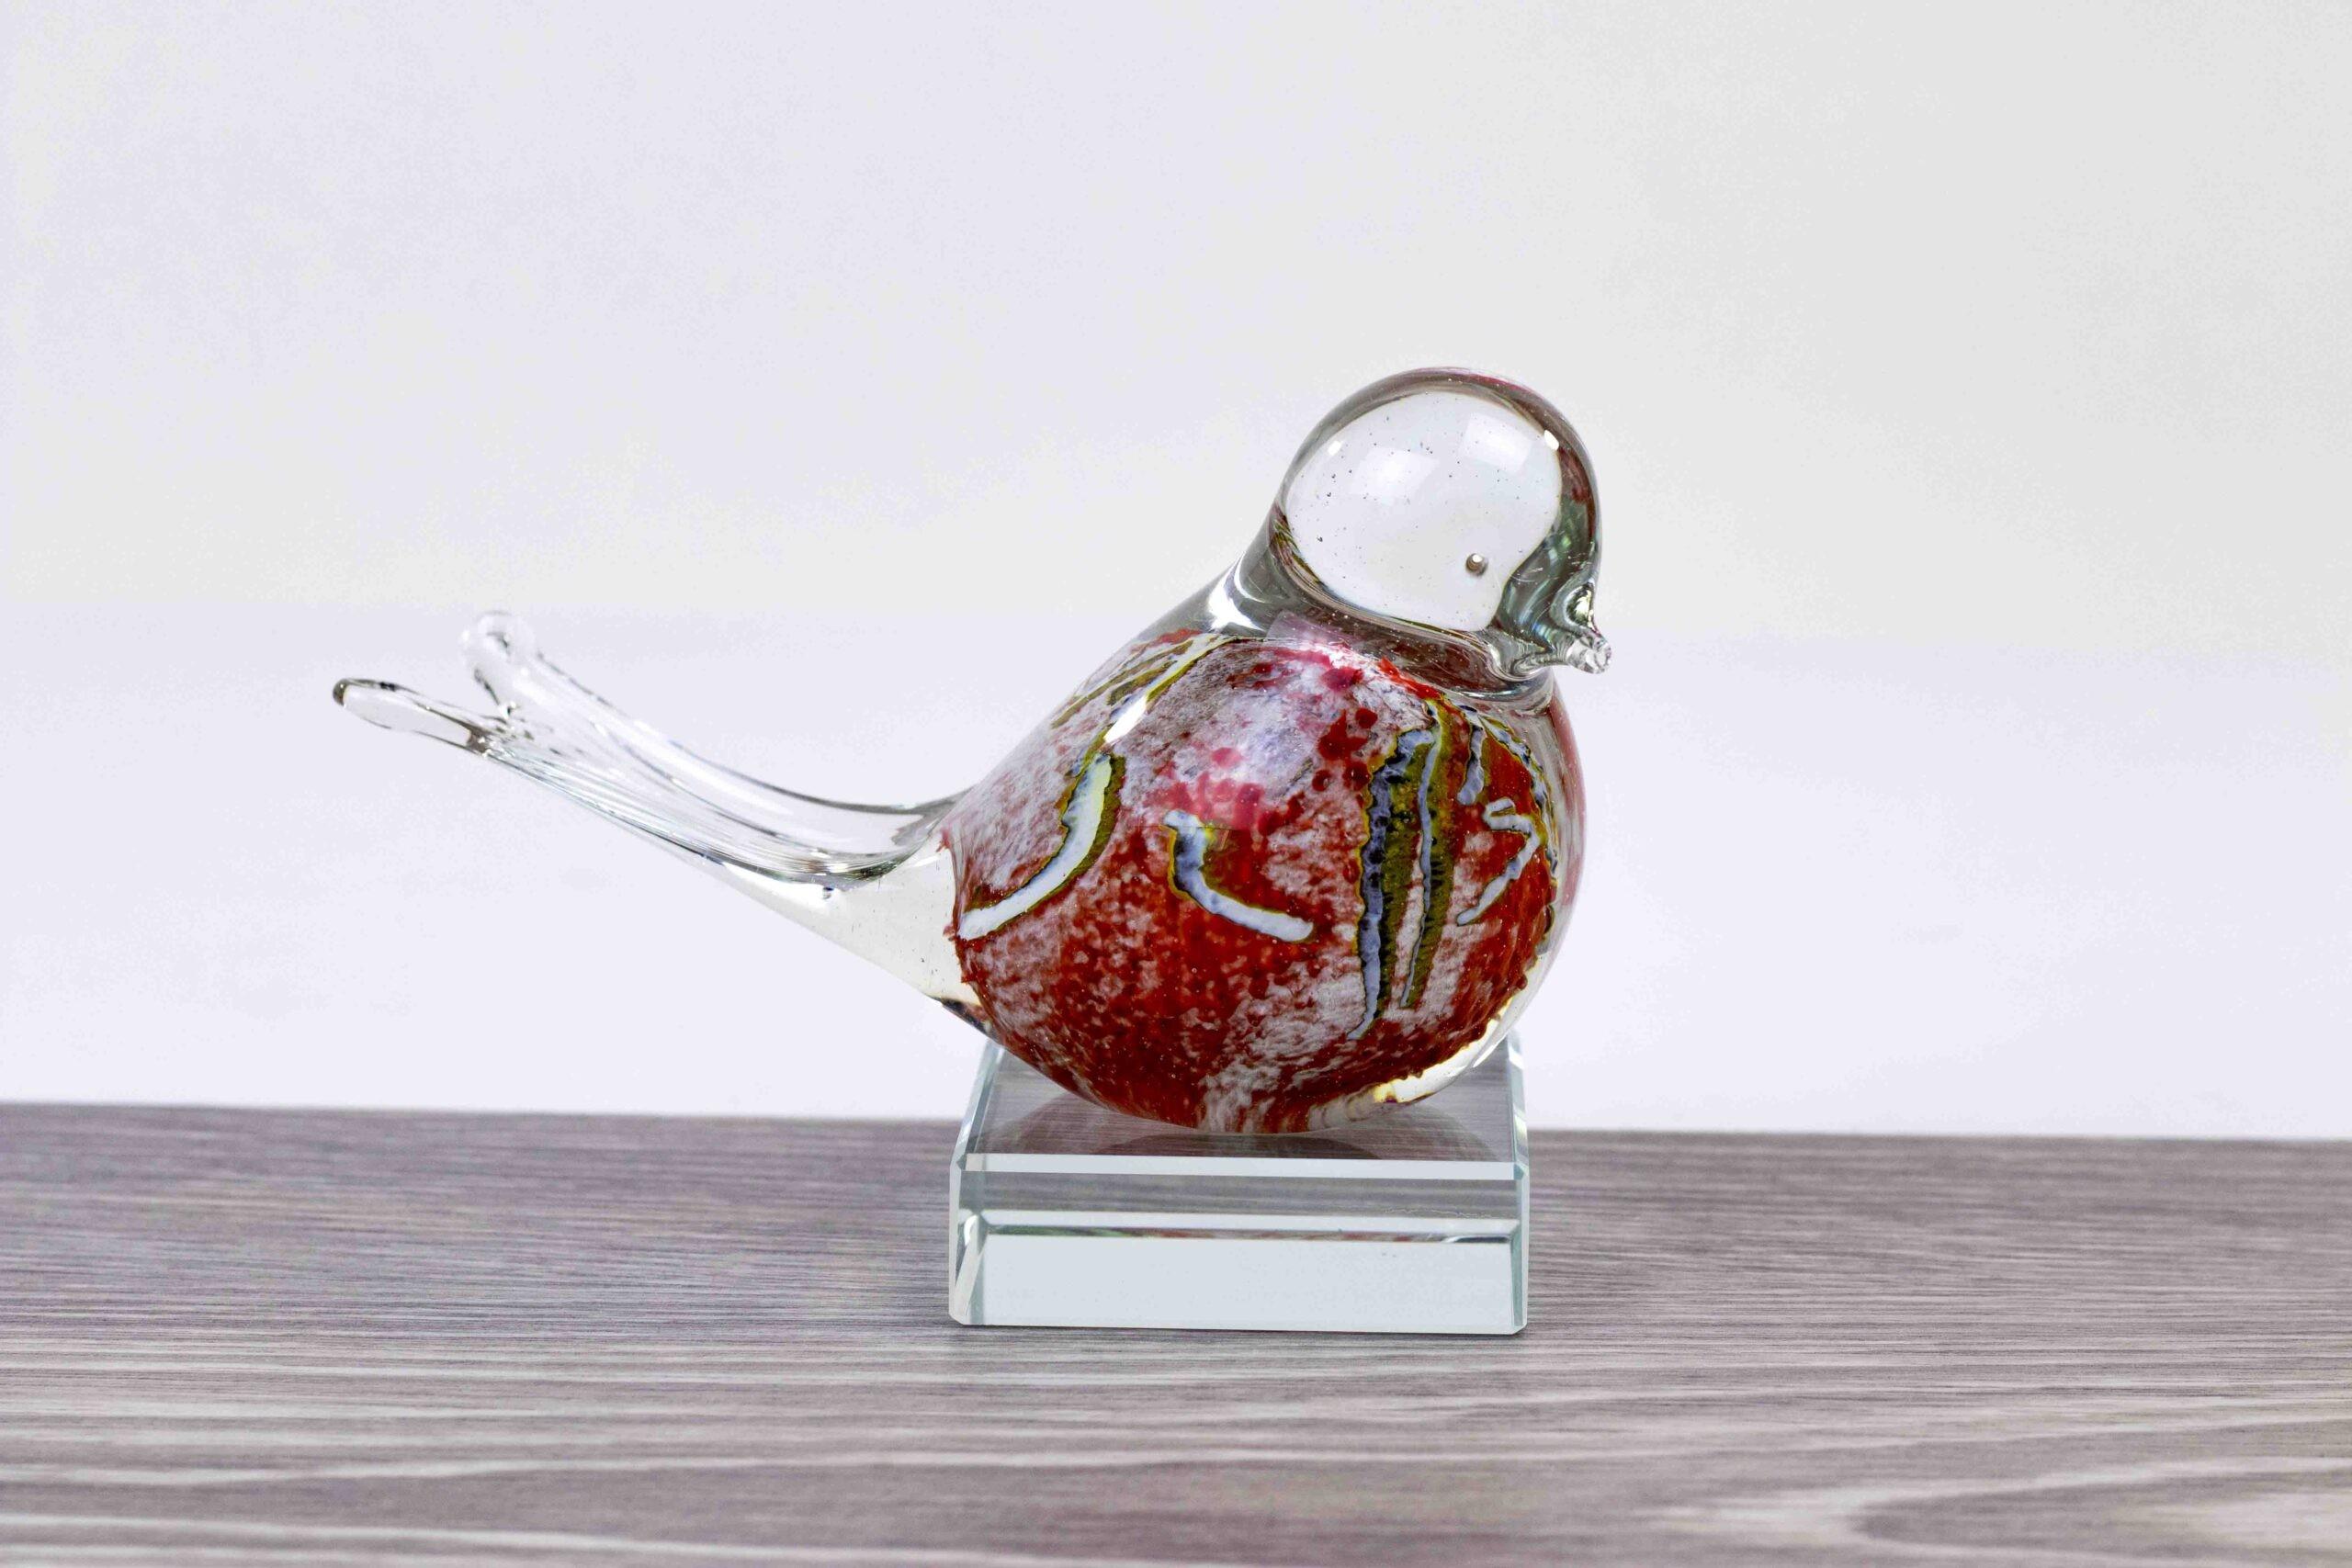 Mini Urn Vogel Rood Wit op Kristallen sokkel, kleine Urn